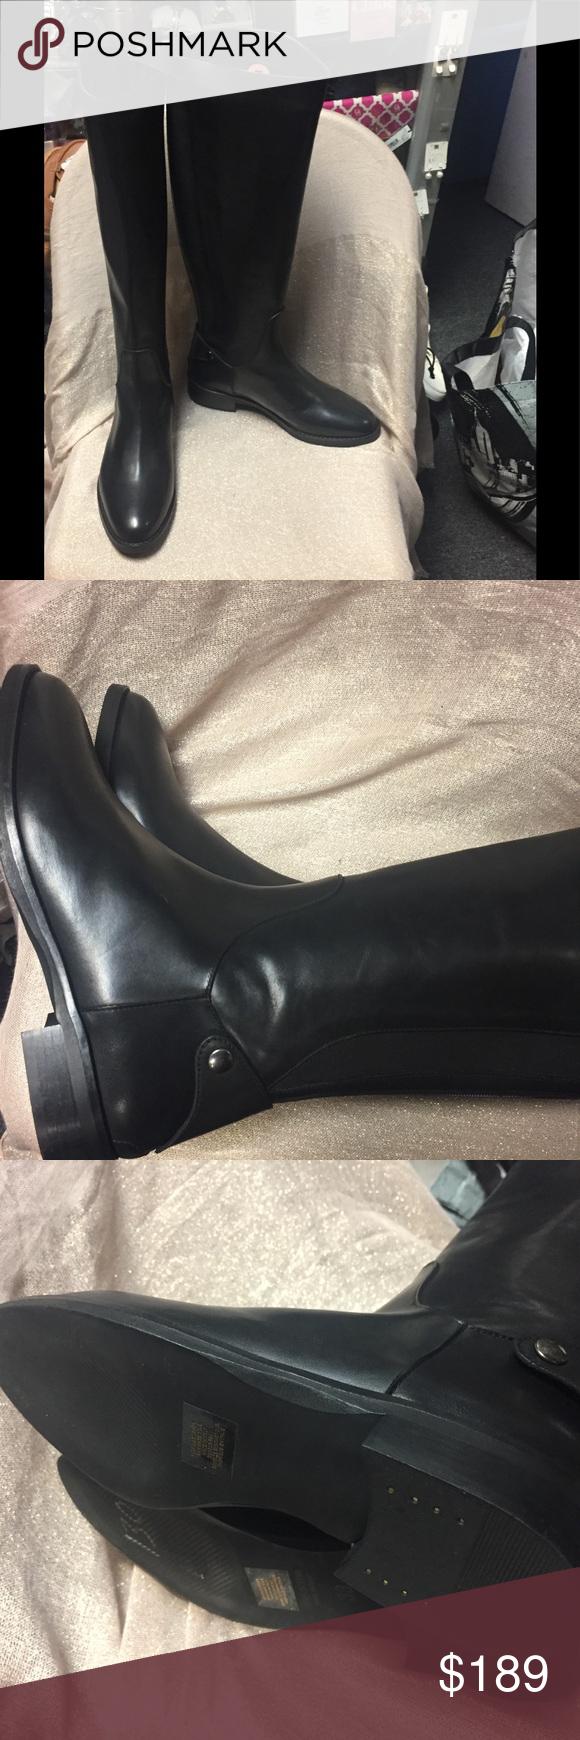 Stella Monelle BootsNEW | Boots